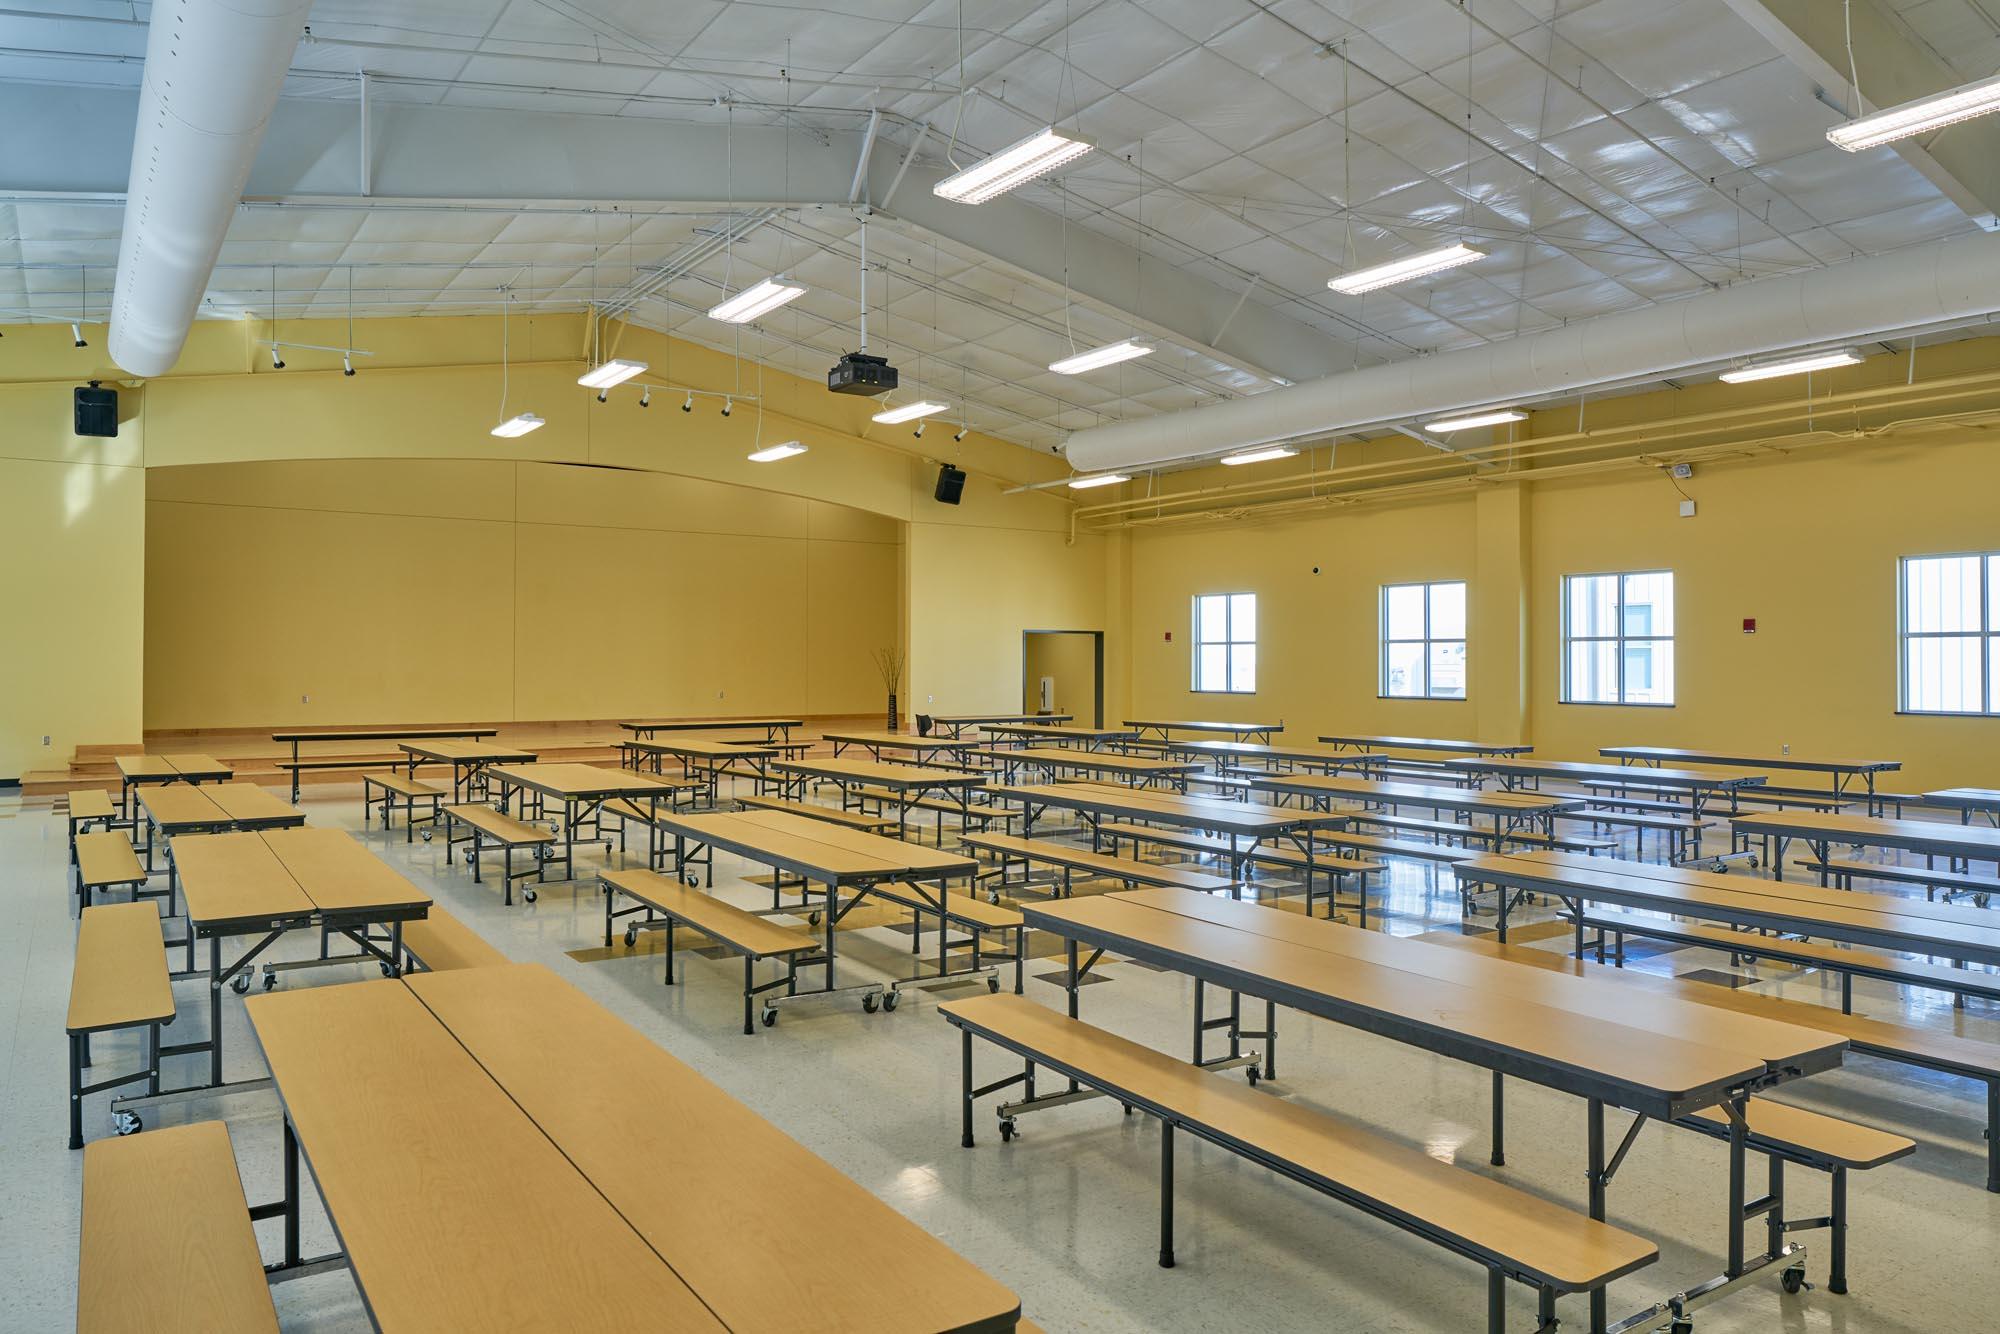 Truman-Elem-School-08.jpg